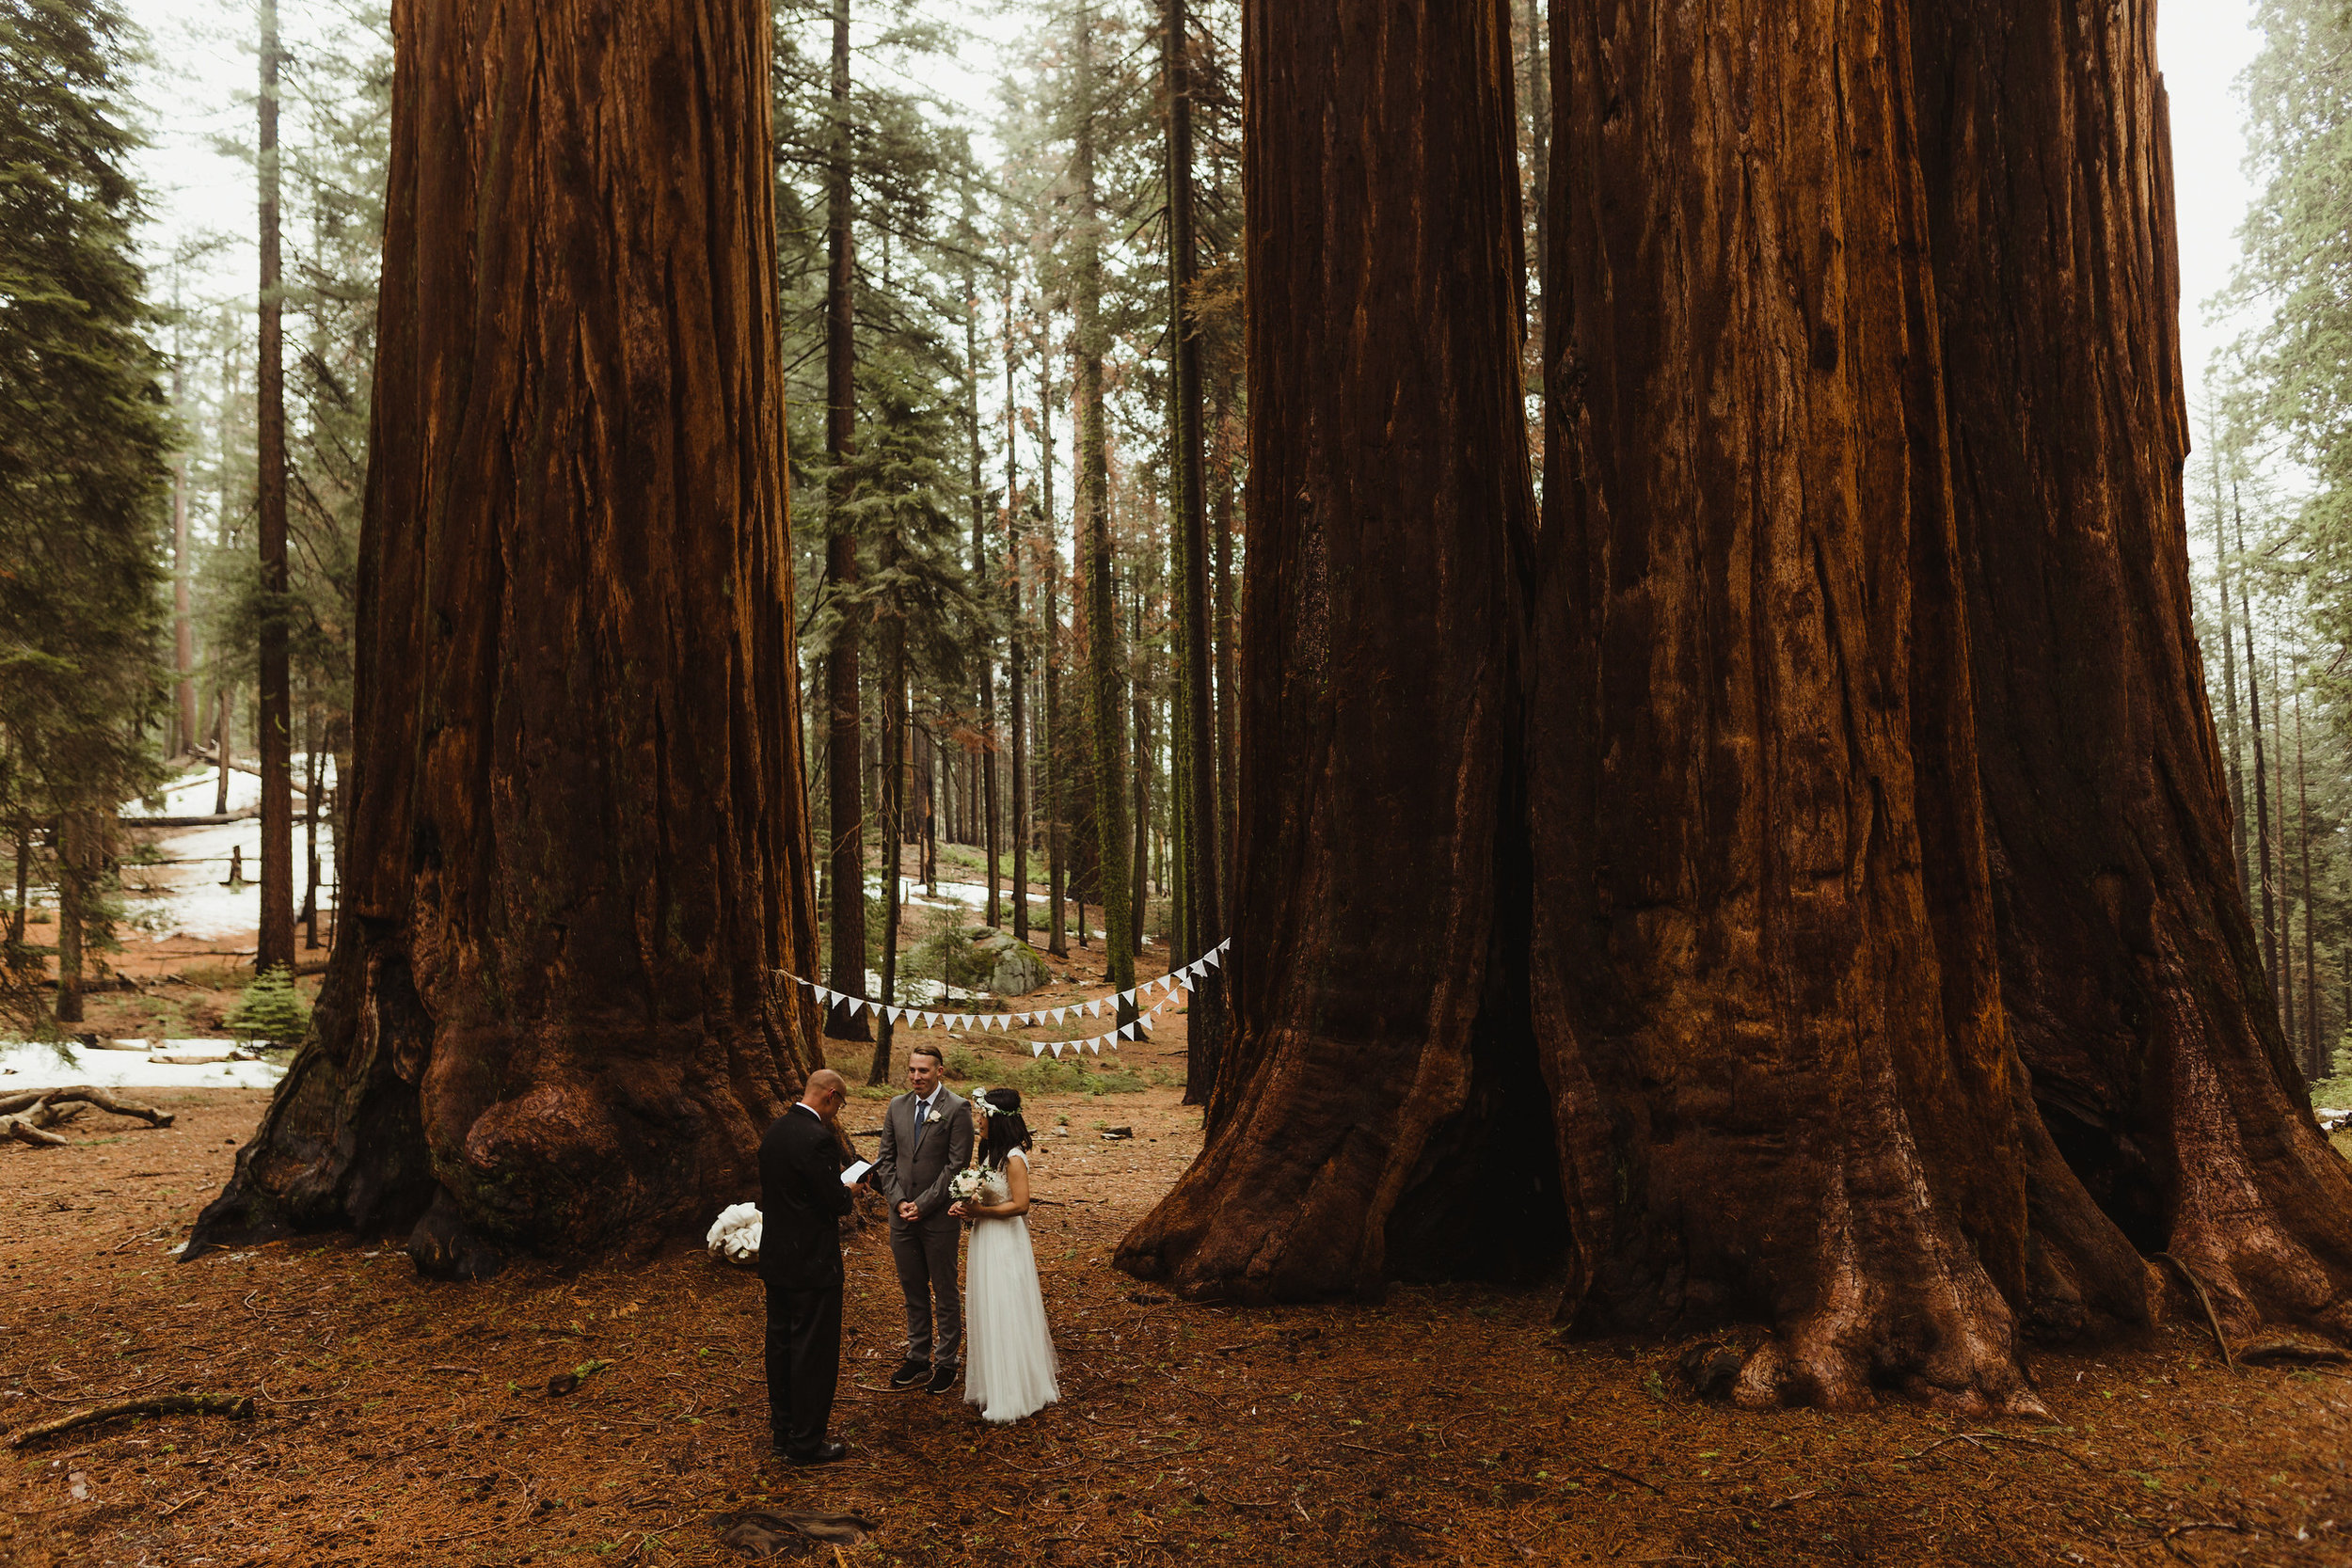 SequoiaNationalParkElopementAfiercelovephotography.jpg